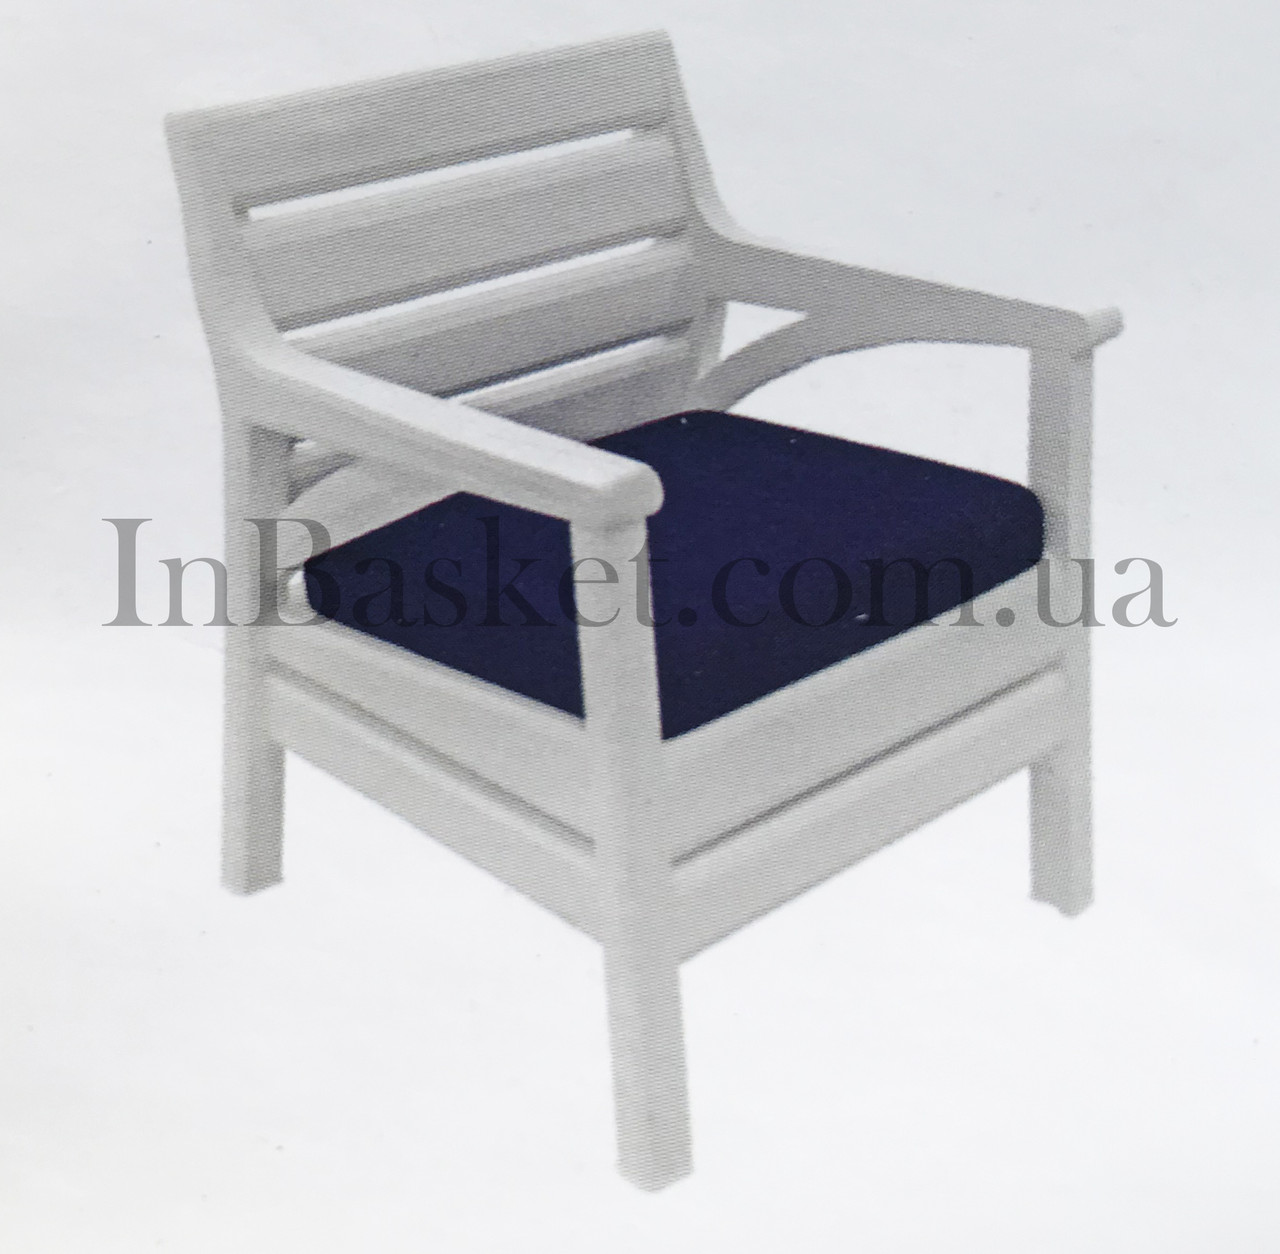 "Пластиковое Кресло ""Single Sofa"" (HK-850)"